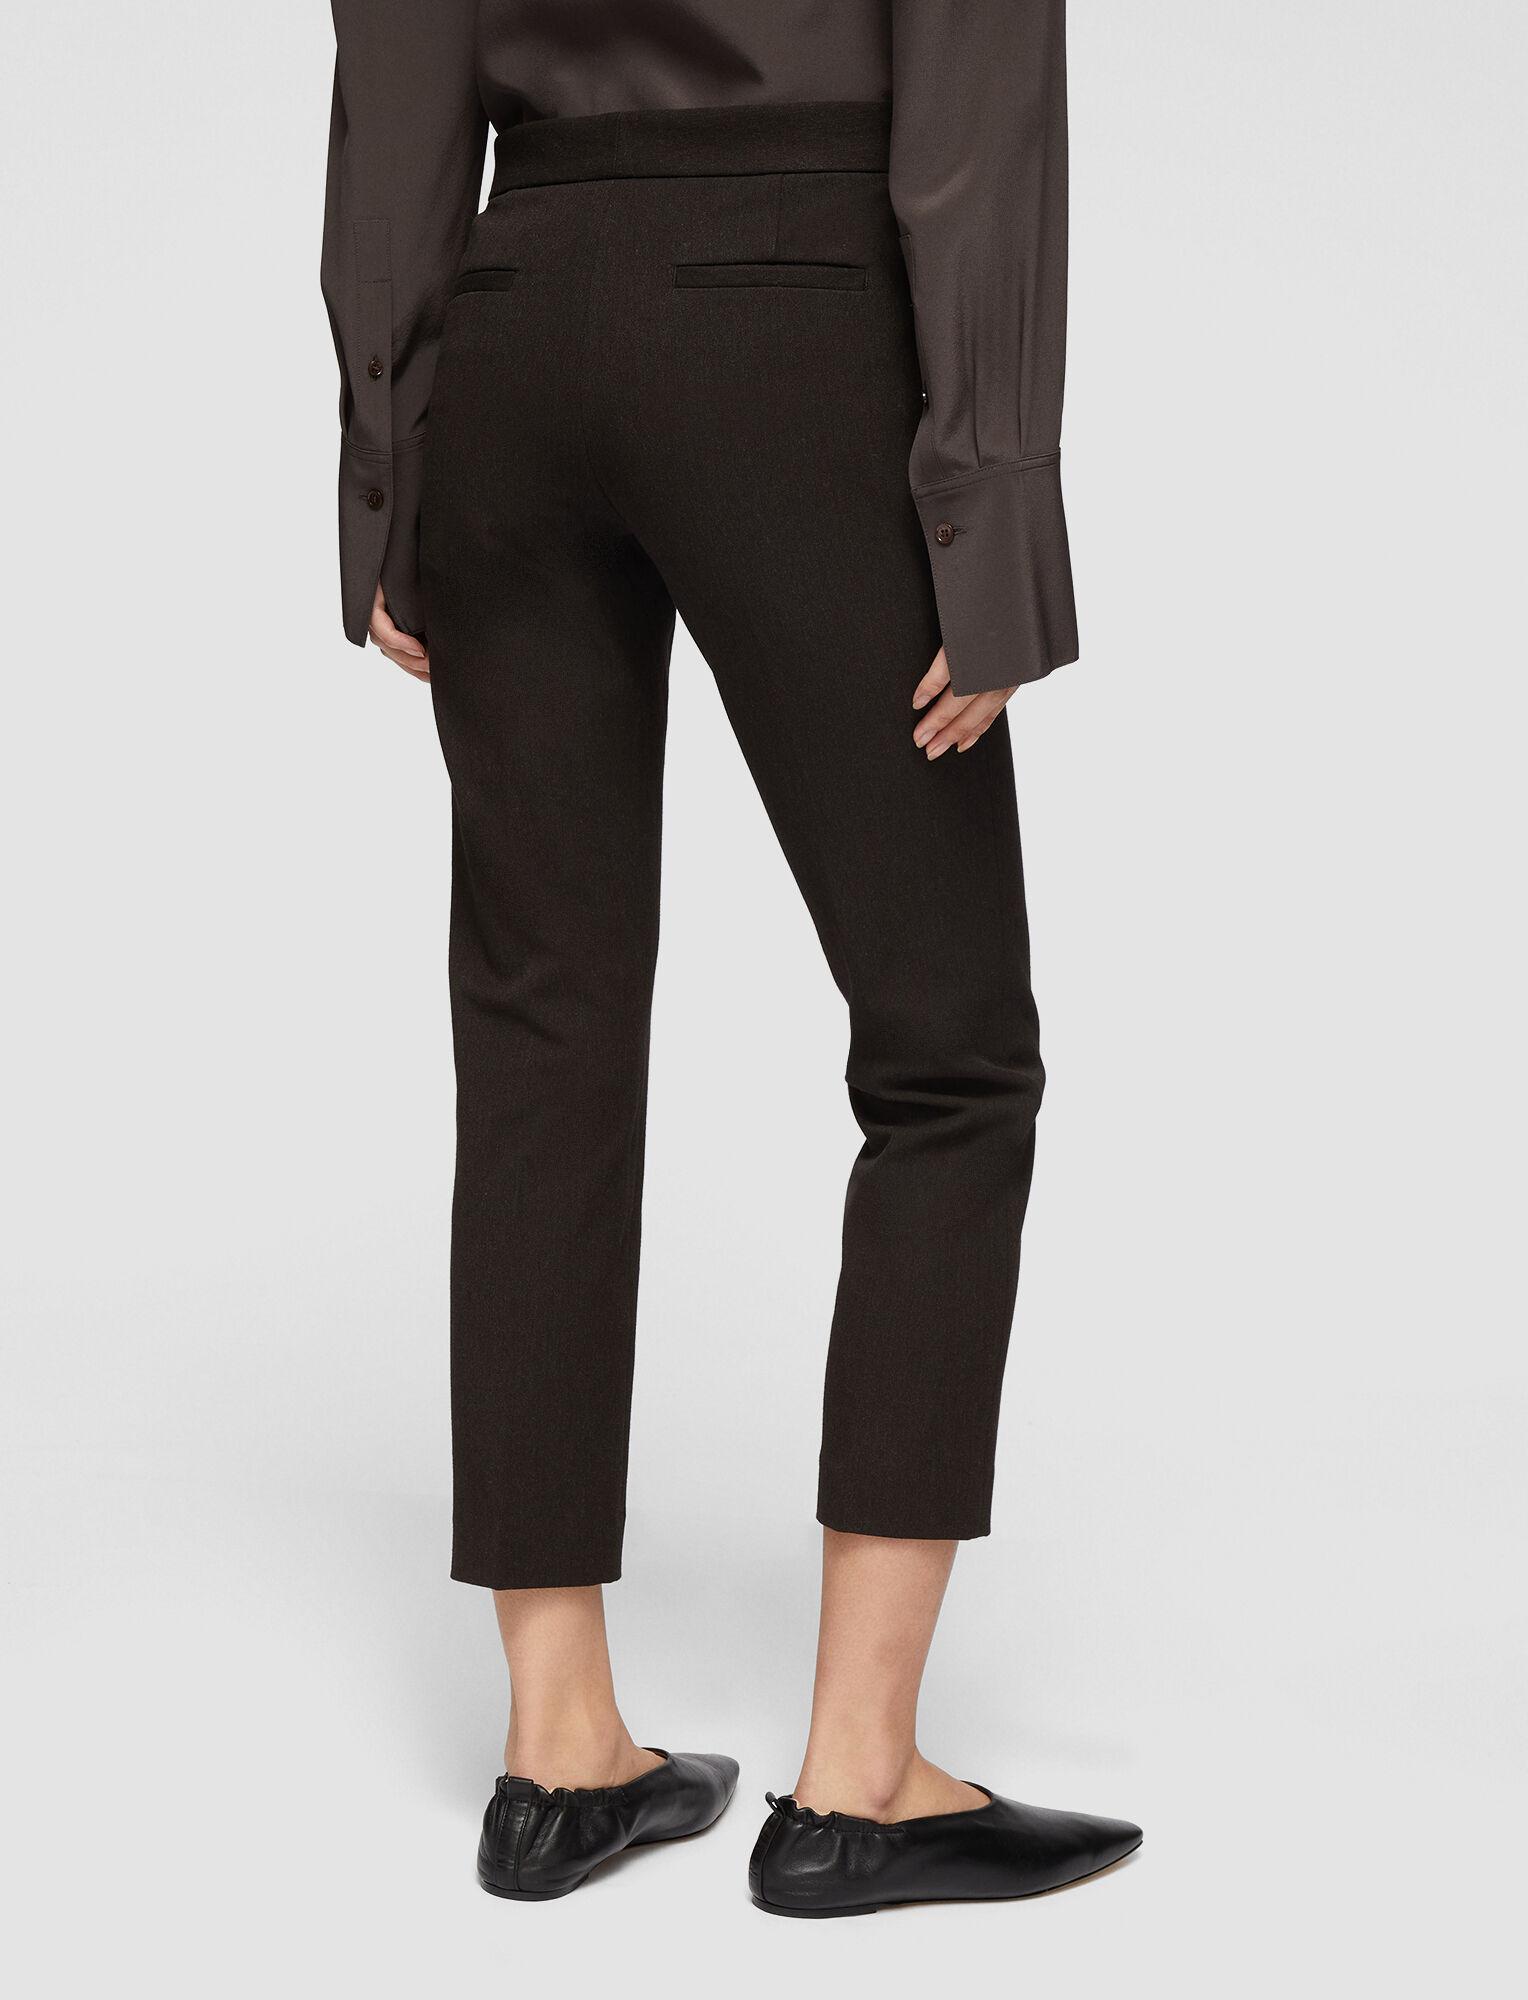 Joseph, Melange Gabardine Stretch Queen Trousers, in JAVA